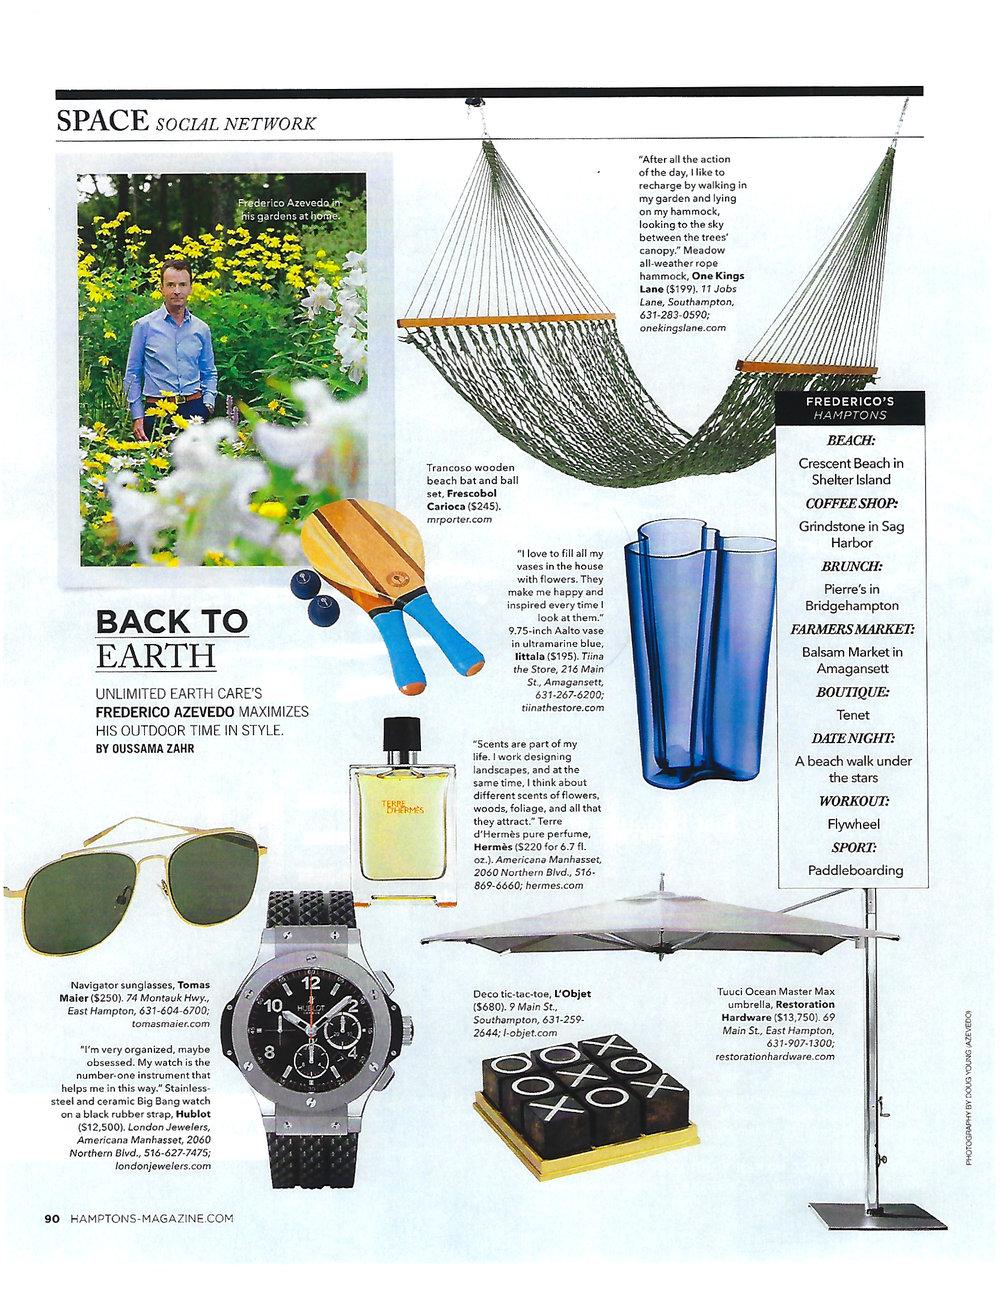 Hamptons Magazine - Back to Earth_August 2017.jpg